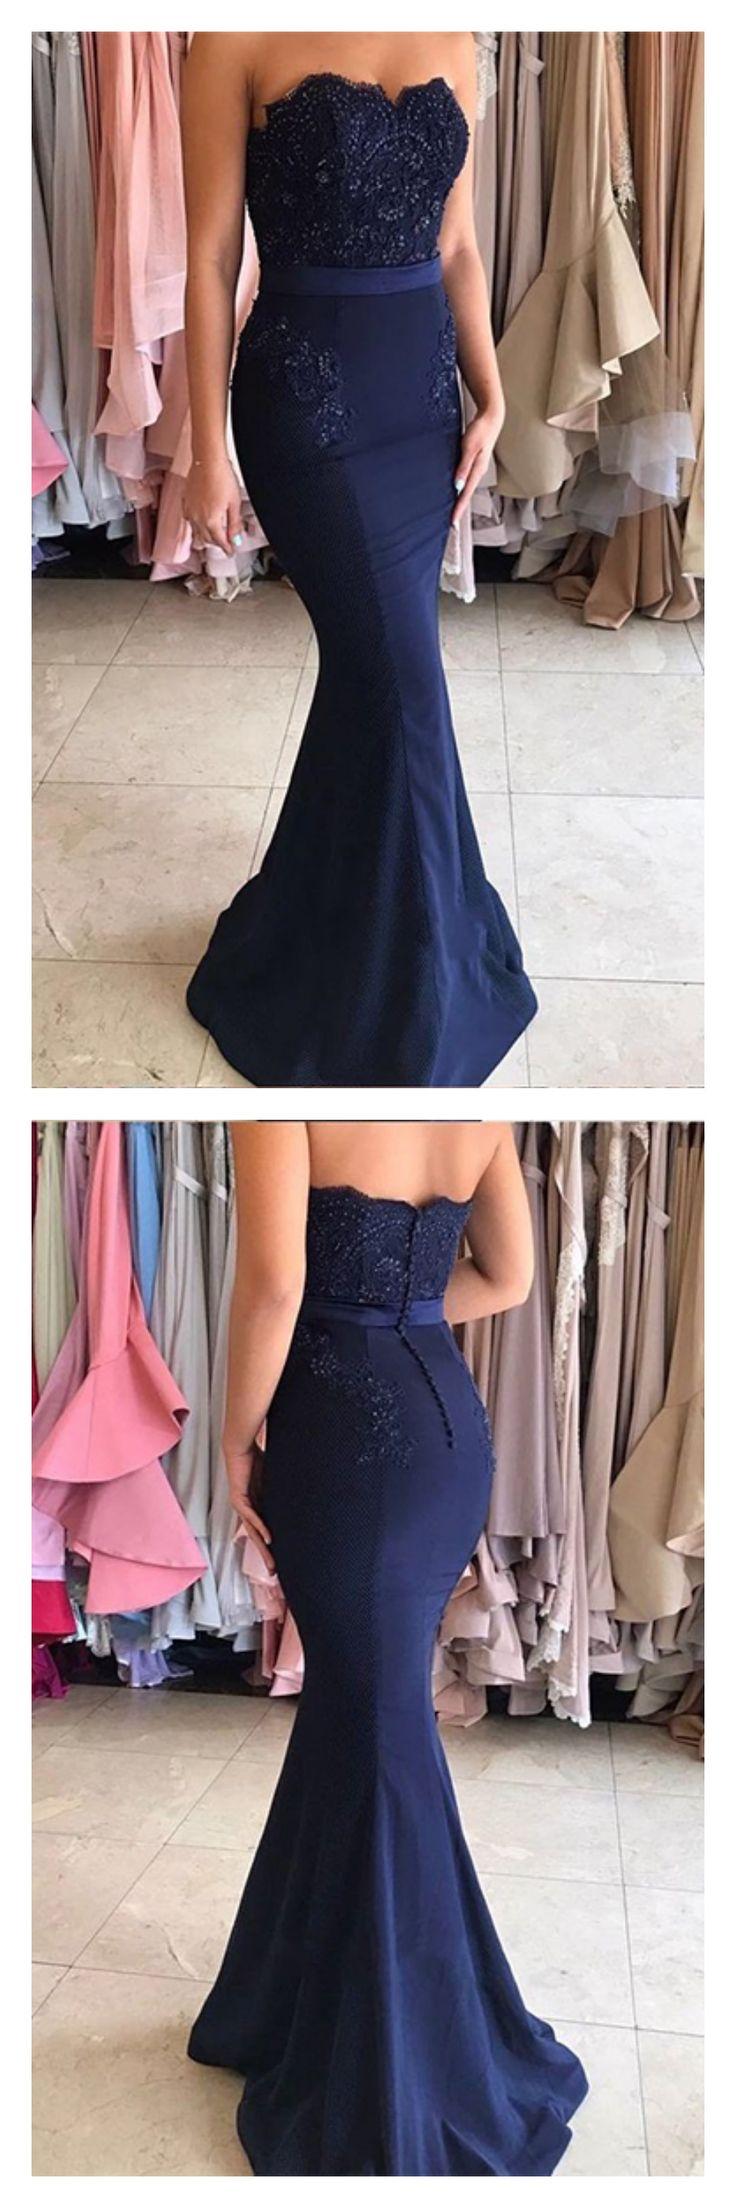 sweetheart beading bodice long mermaid prom dresses evening dresses ed1586 sch ne kleider. Black Bedroom Furniture Sets. Home Design Ideas